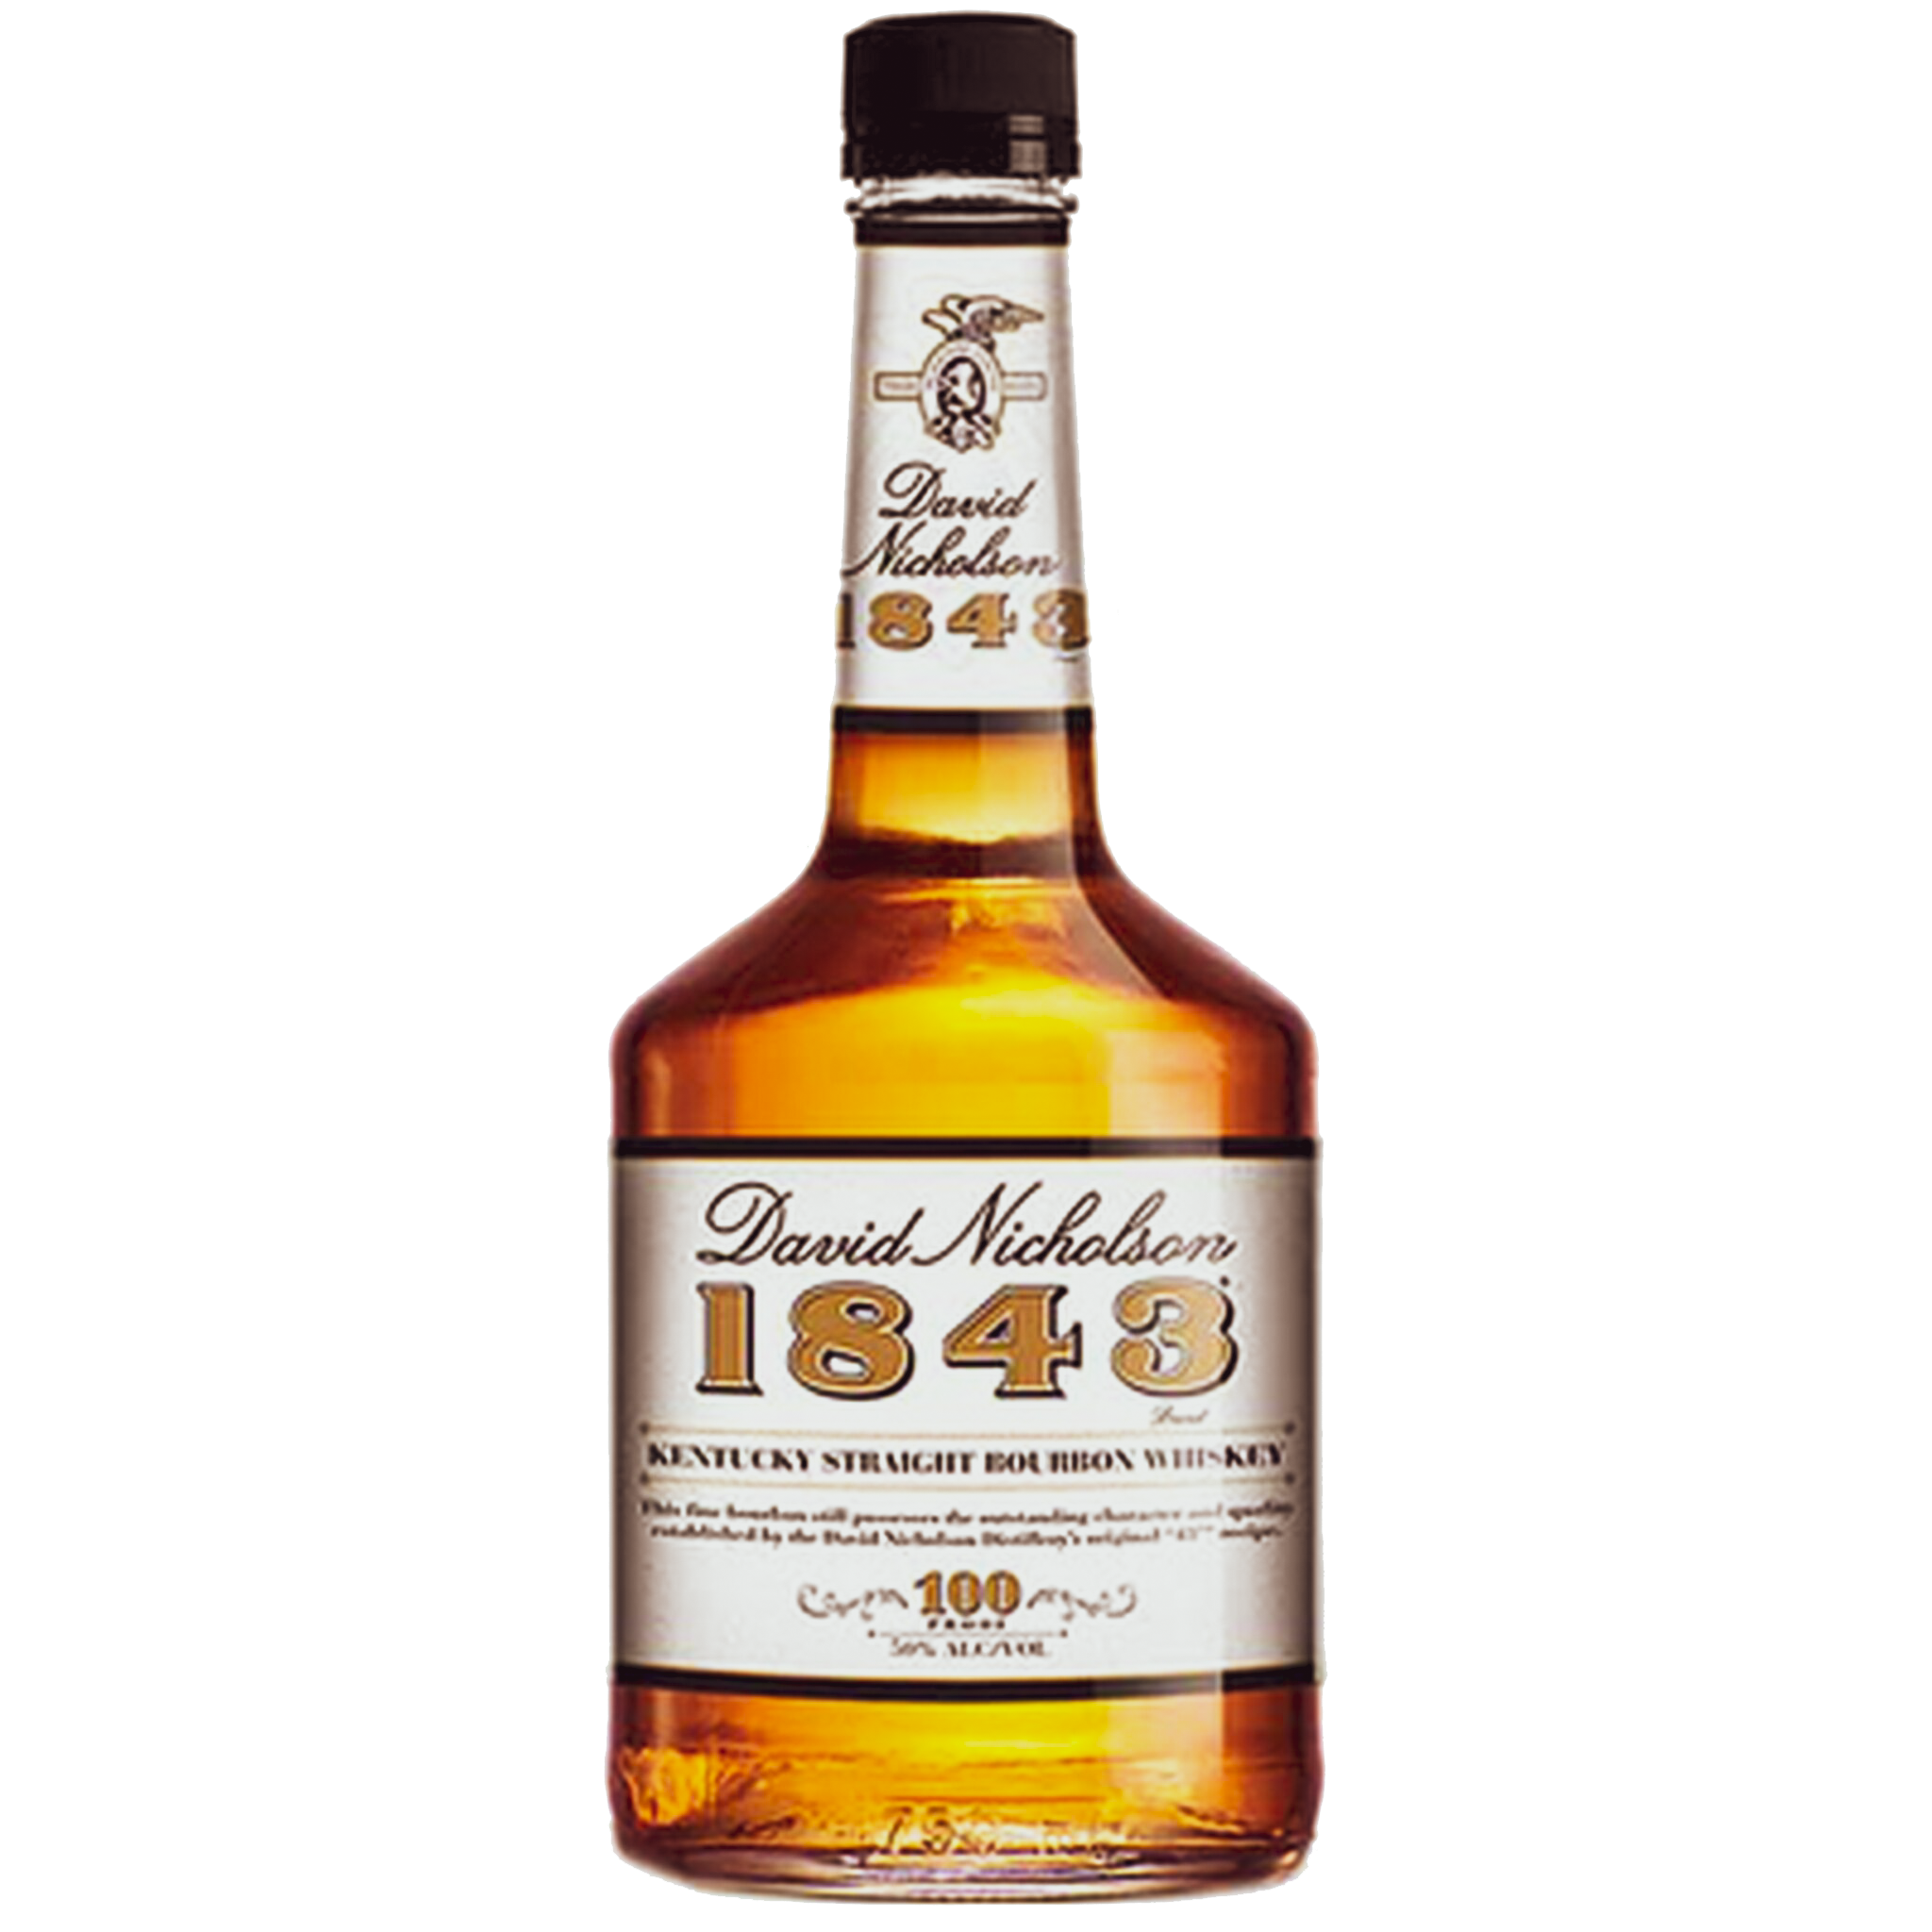 David Nicholson 1843 Straight Bourbon Whiskey